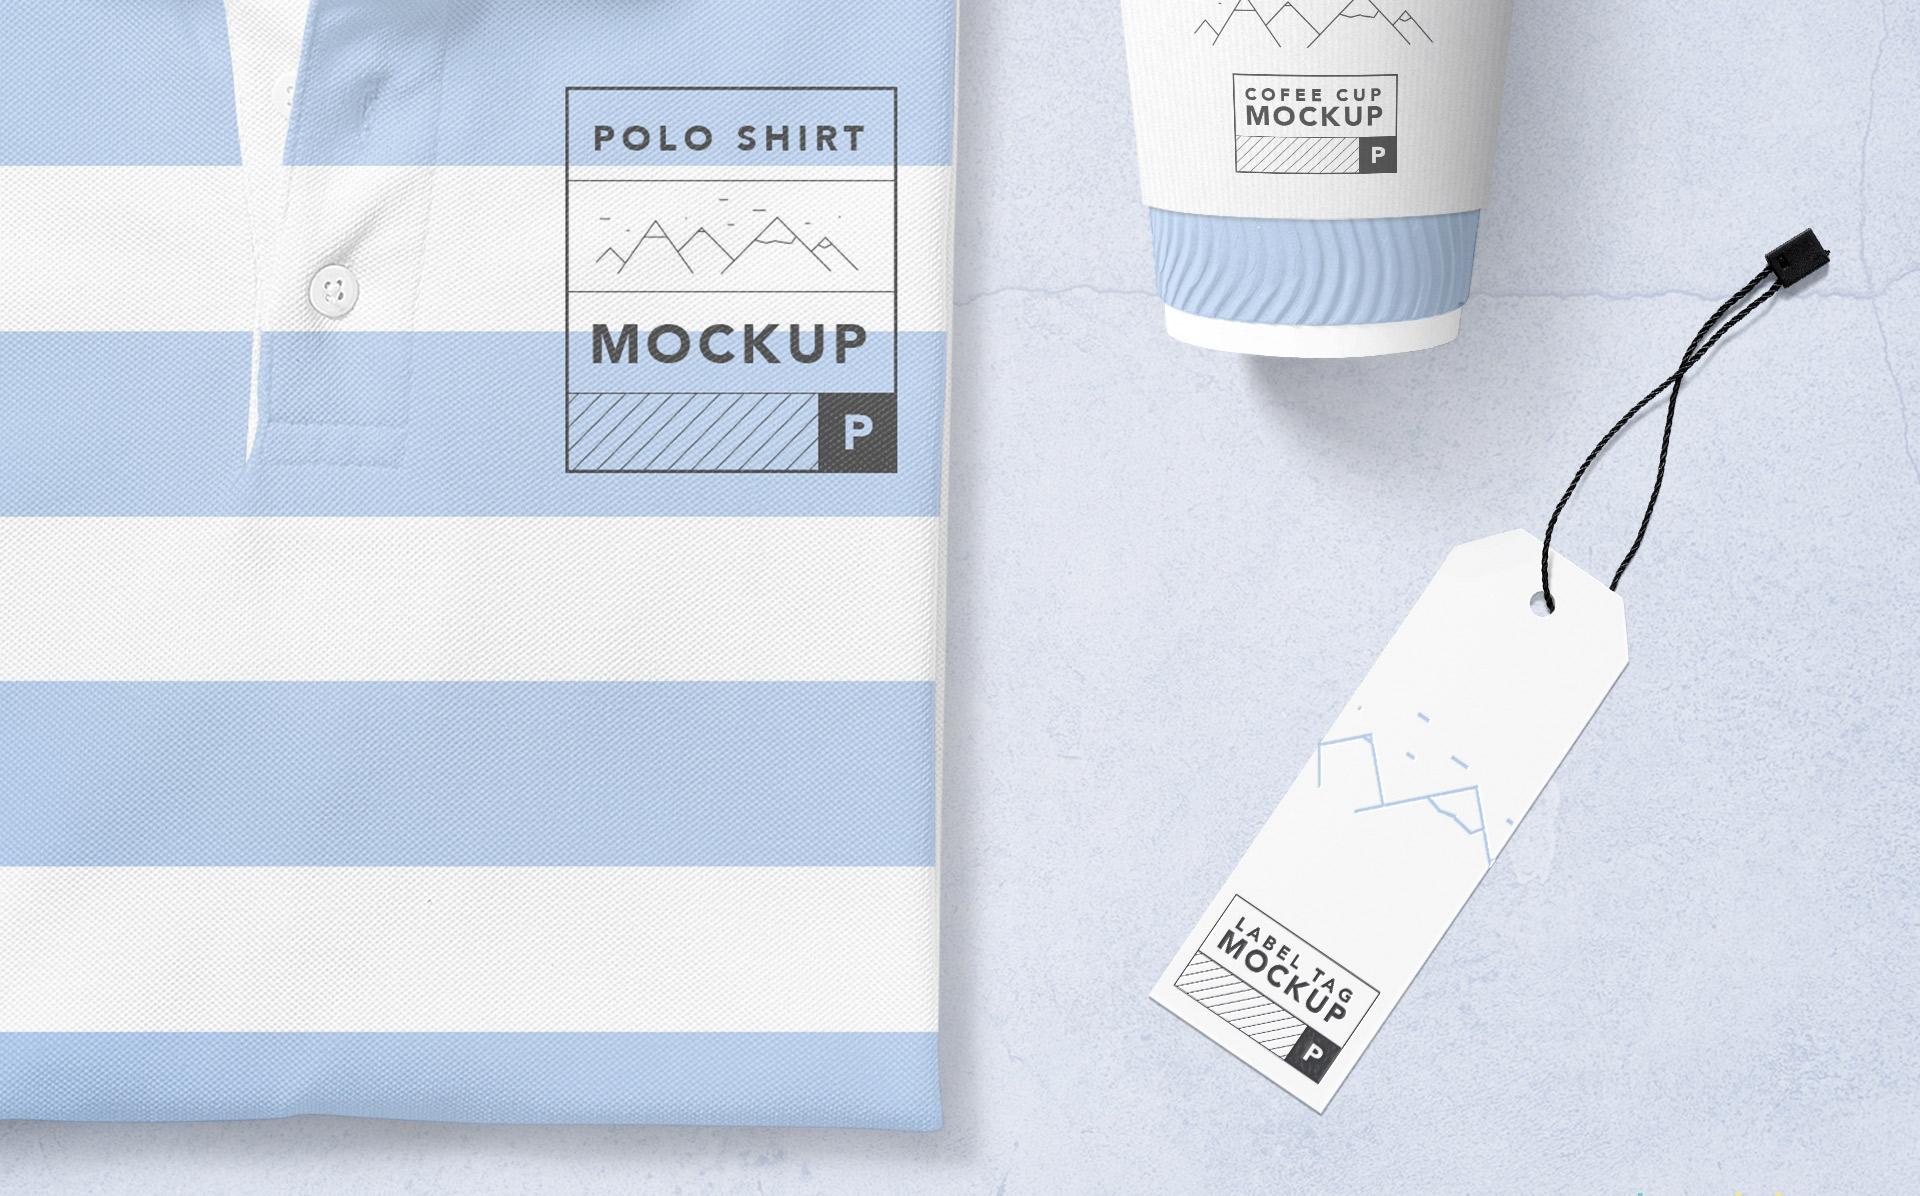 现代马球T恤样机  品牌VI样机Modern Polo T-Shirt Mockup